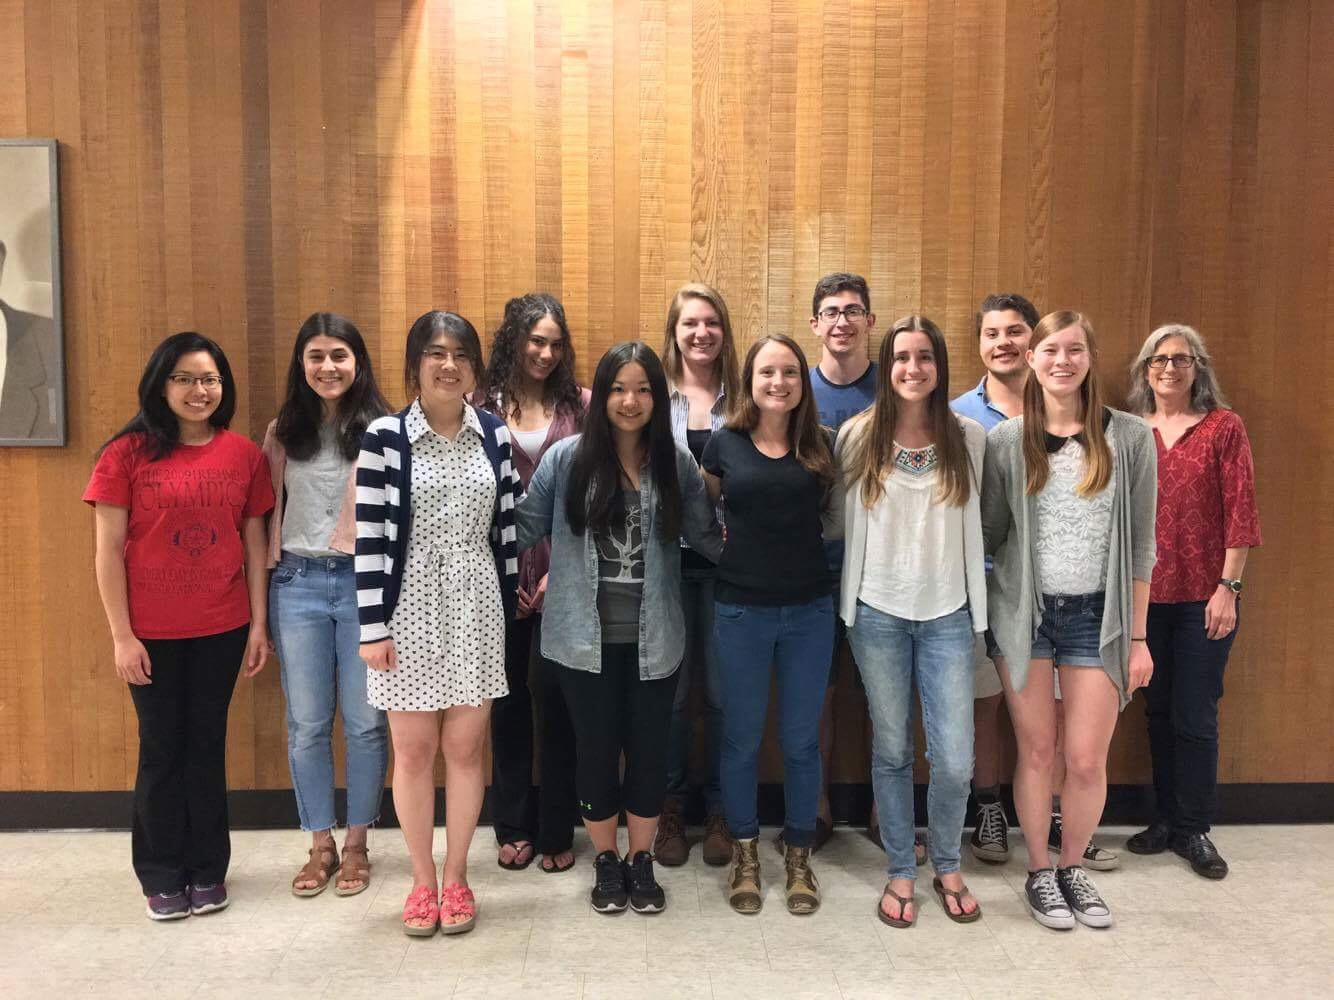 Editorial Board 2016-2017. (Left to Right) Back: Carly, Bukre, Chantele, Madison, Bardia, Nick, Dr. Burgess. Front: Lo, Lauren, Wren, Nicole, Rachel